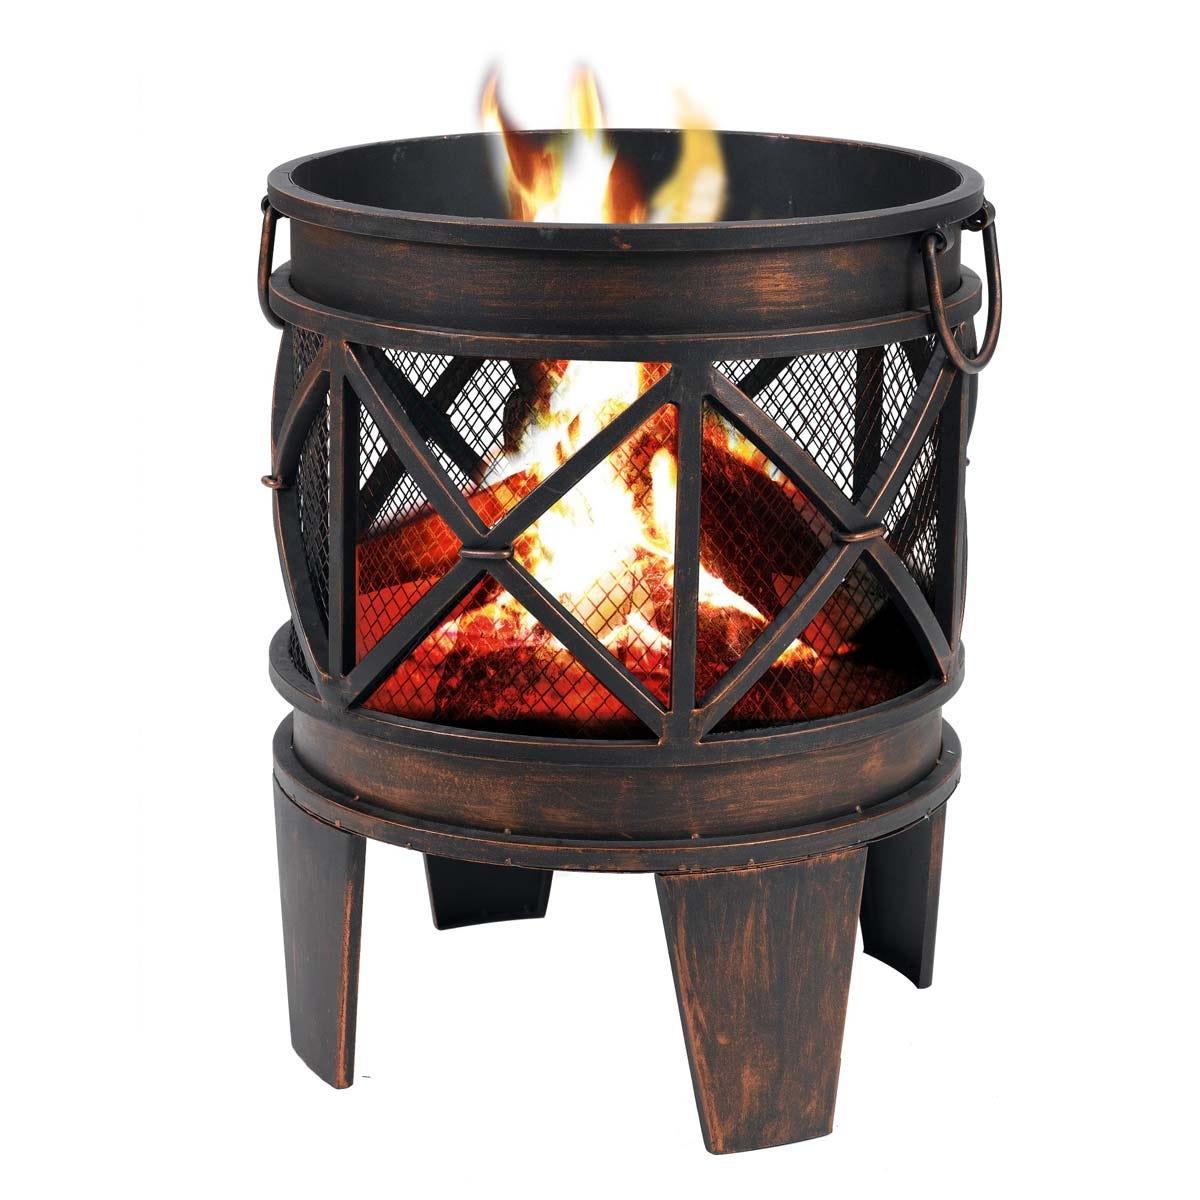 Tepro Gracewood Fire Pit Outdoor Patio Heater